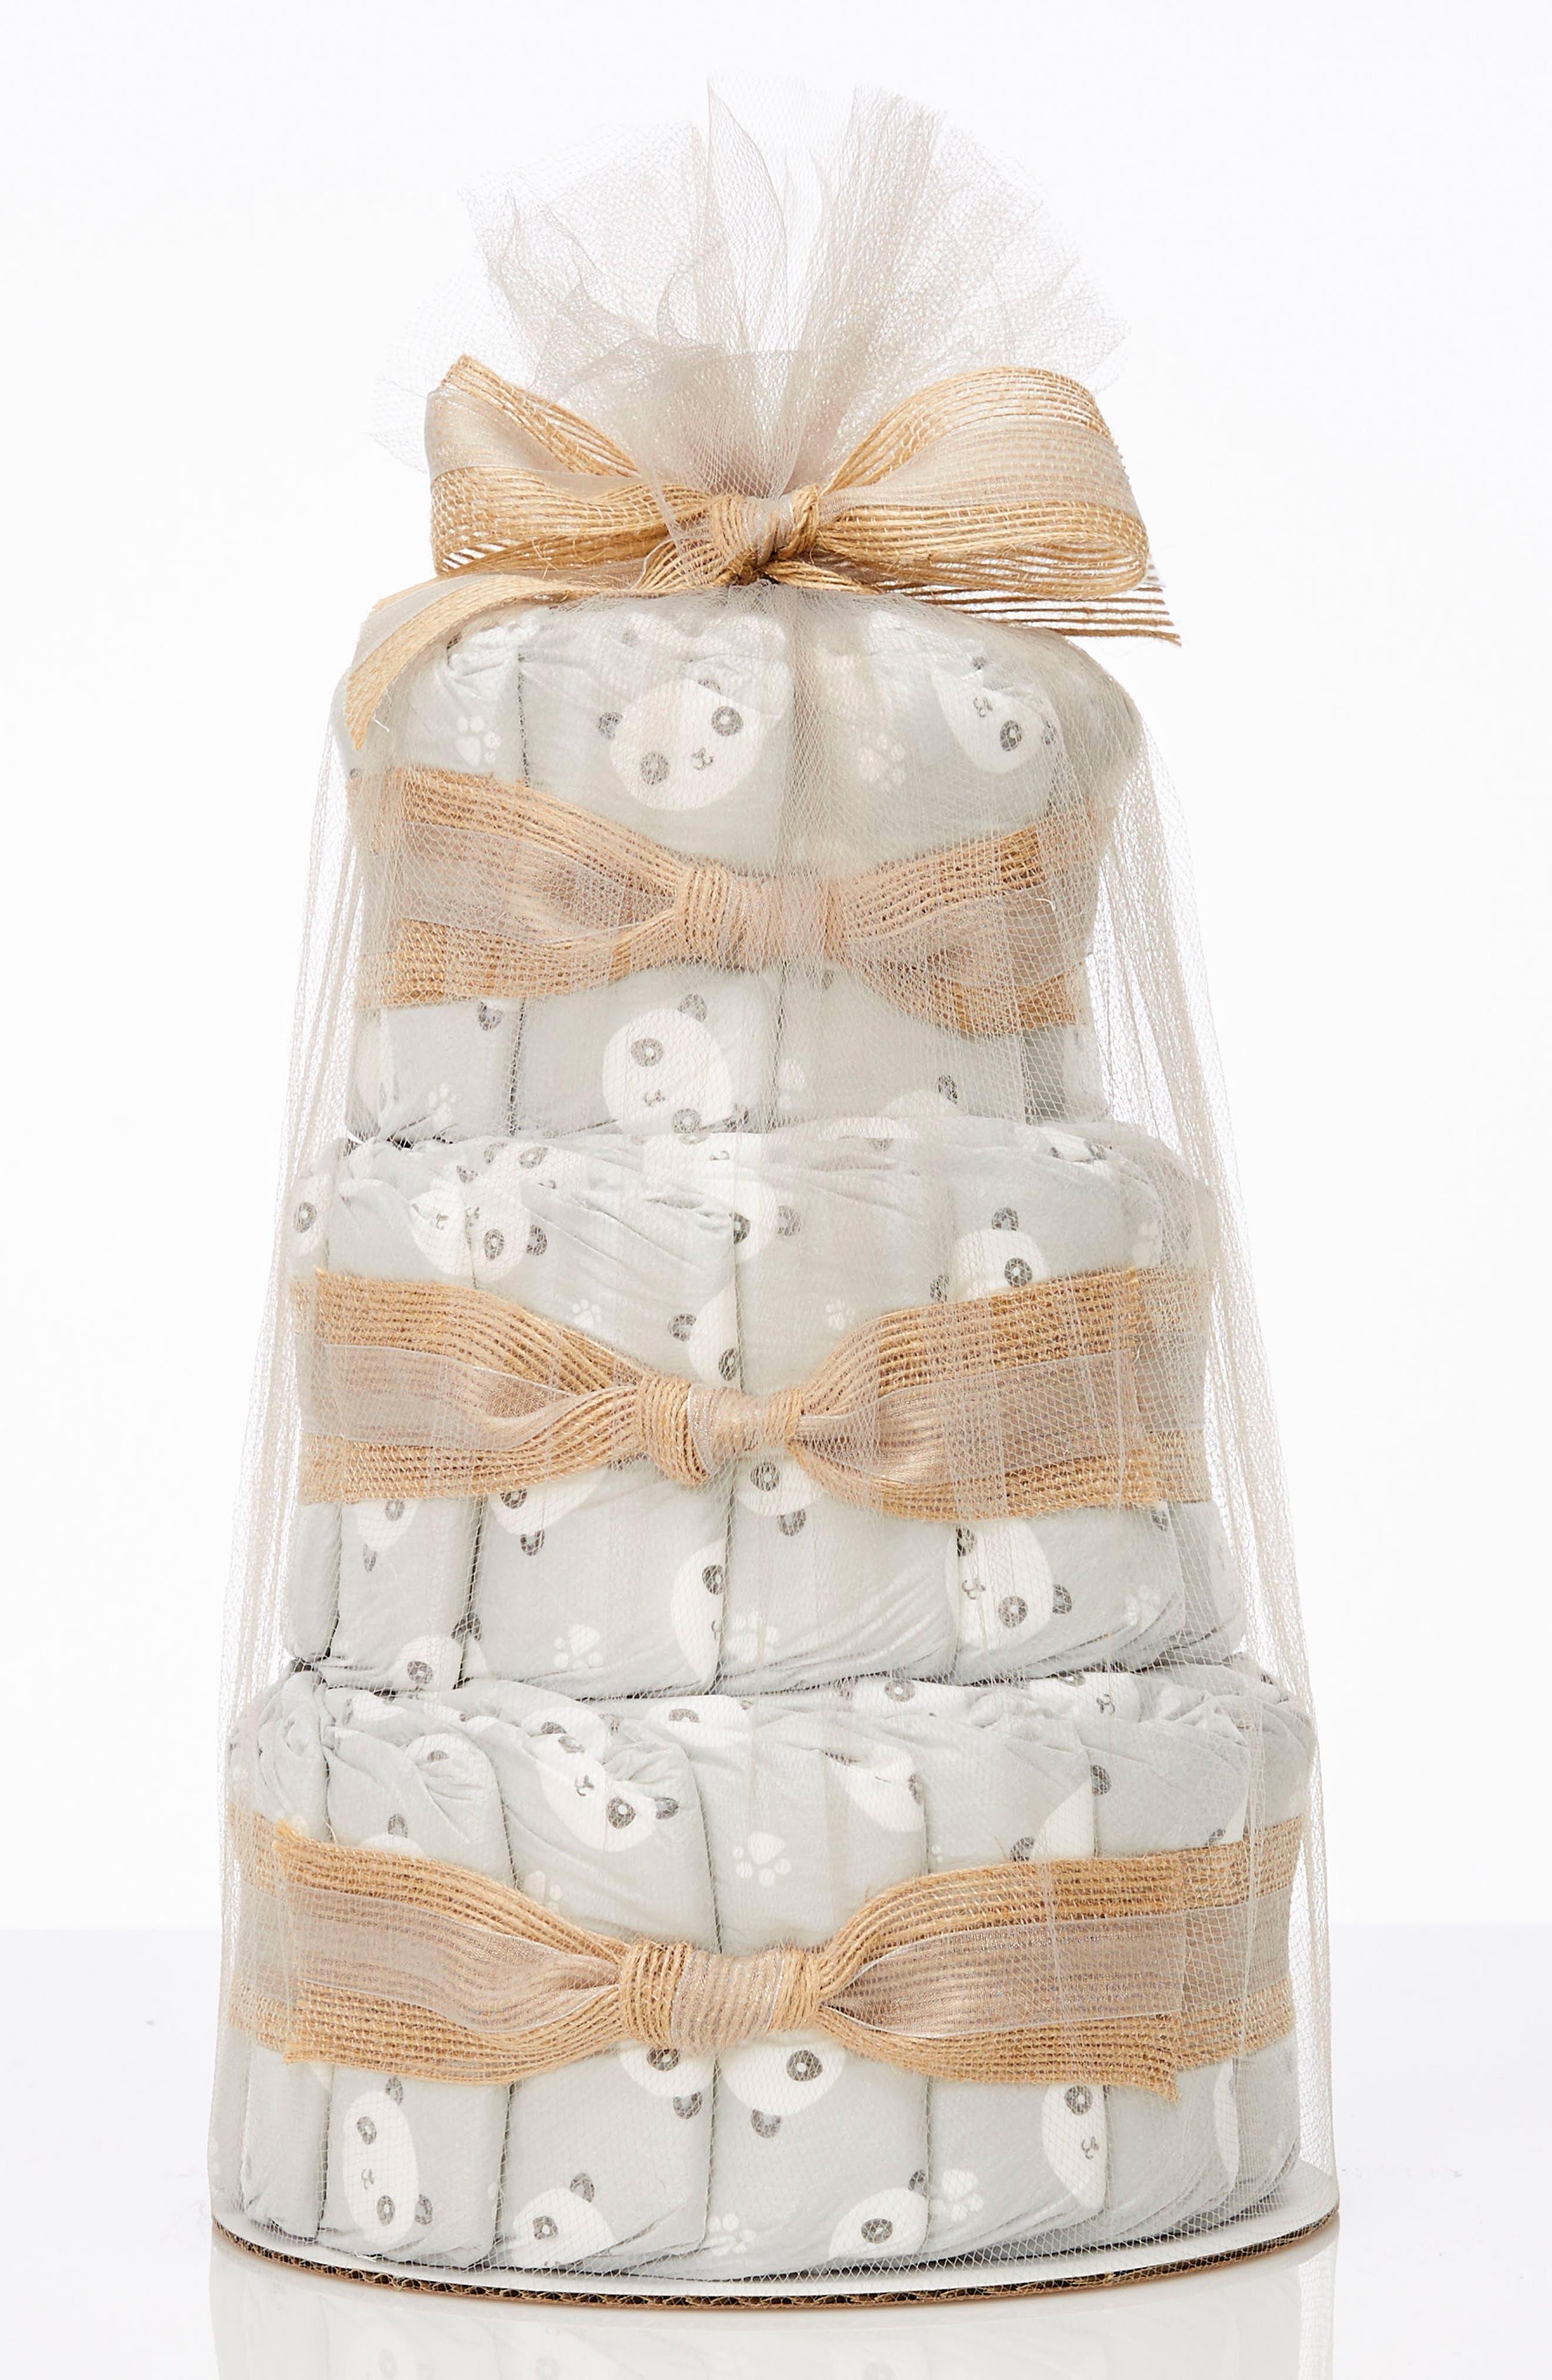 THE HONEST COMPANY, Mini Diaper Cake & Travel-Size Essentials Set, Main thumbnail 1, color, PANDAS